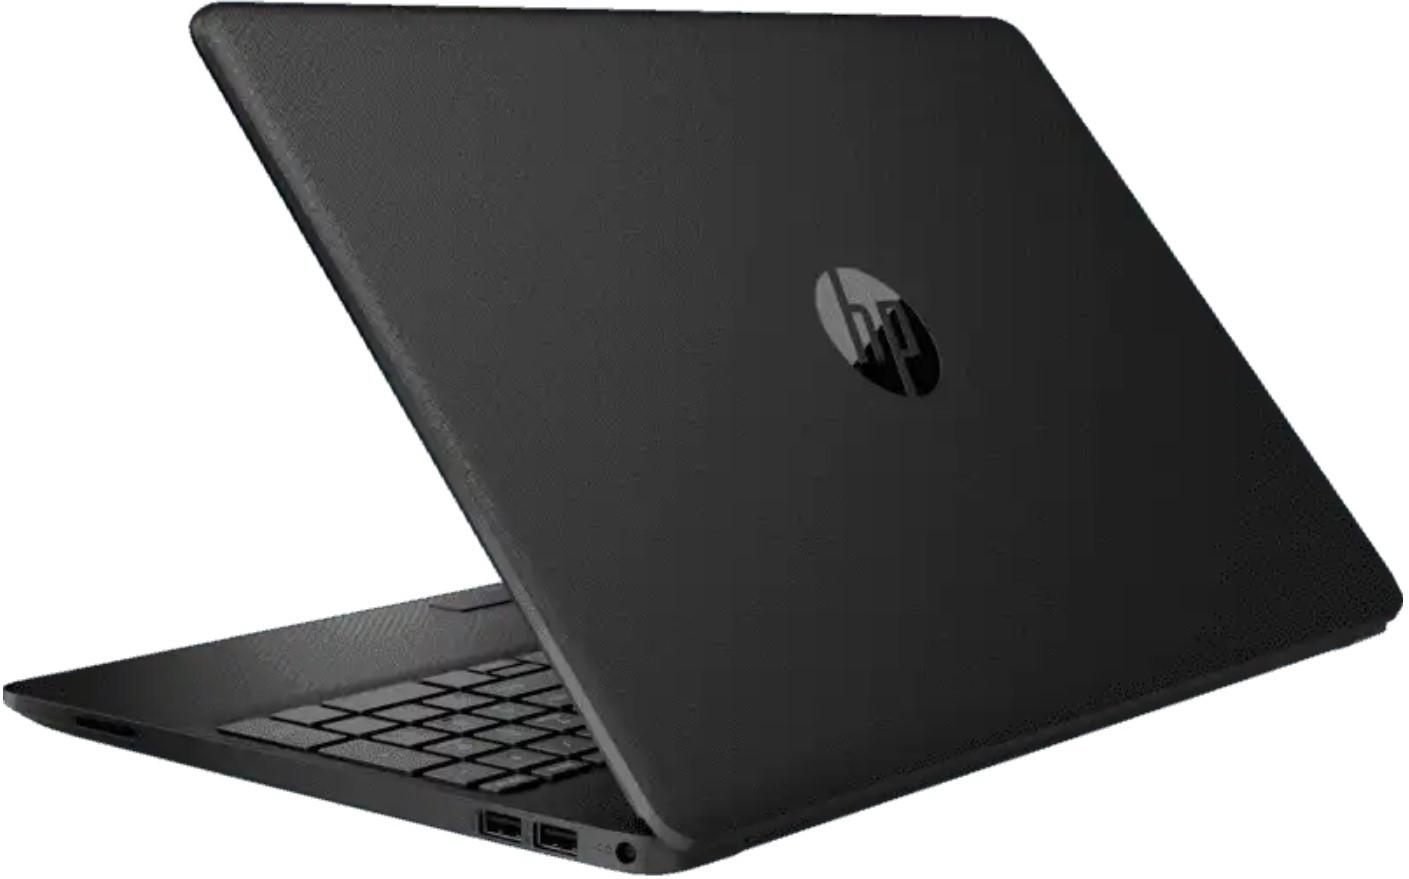 "HP 15S-DU2100TU 15.6"" FHD Laptop, 4GB RAM, 1TB Storage, Intel Core i3-1005G1, No DVD, Windows 10, English Keyboard - Matt Black 1F1D4PA   15S-DU2100TU Buy, Best Price. Global Shipping."